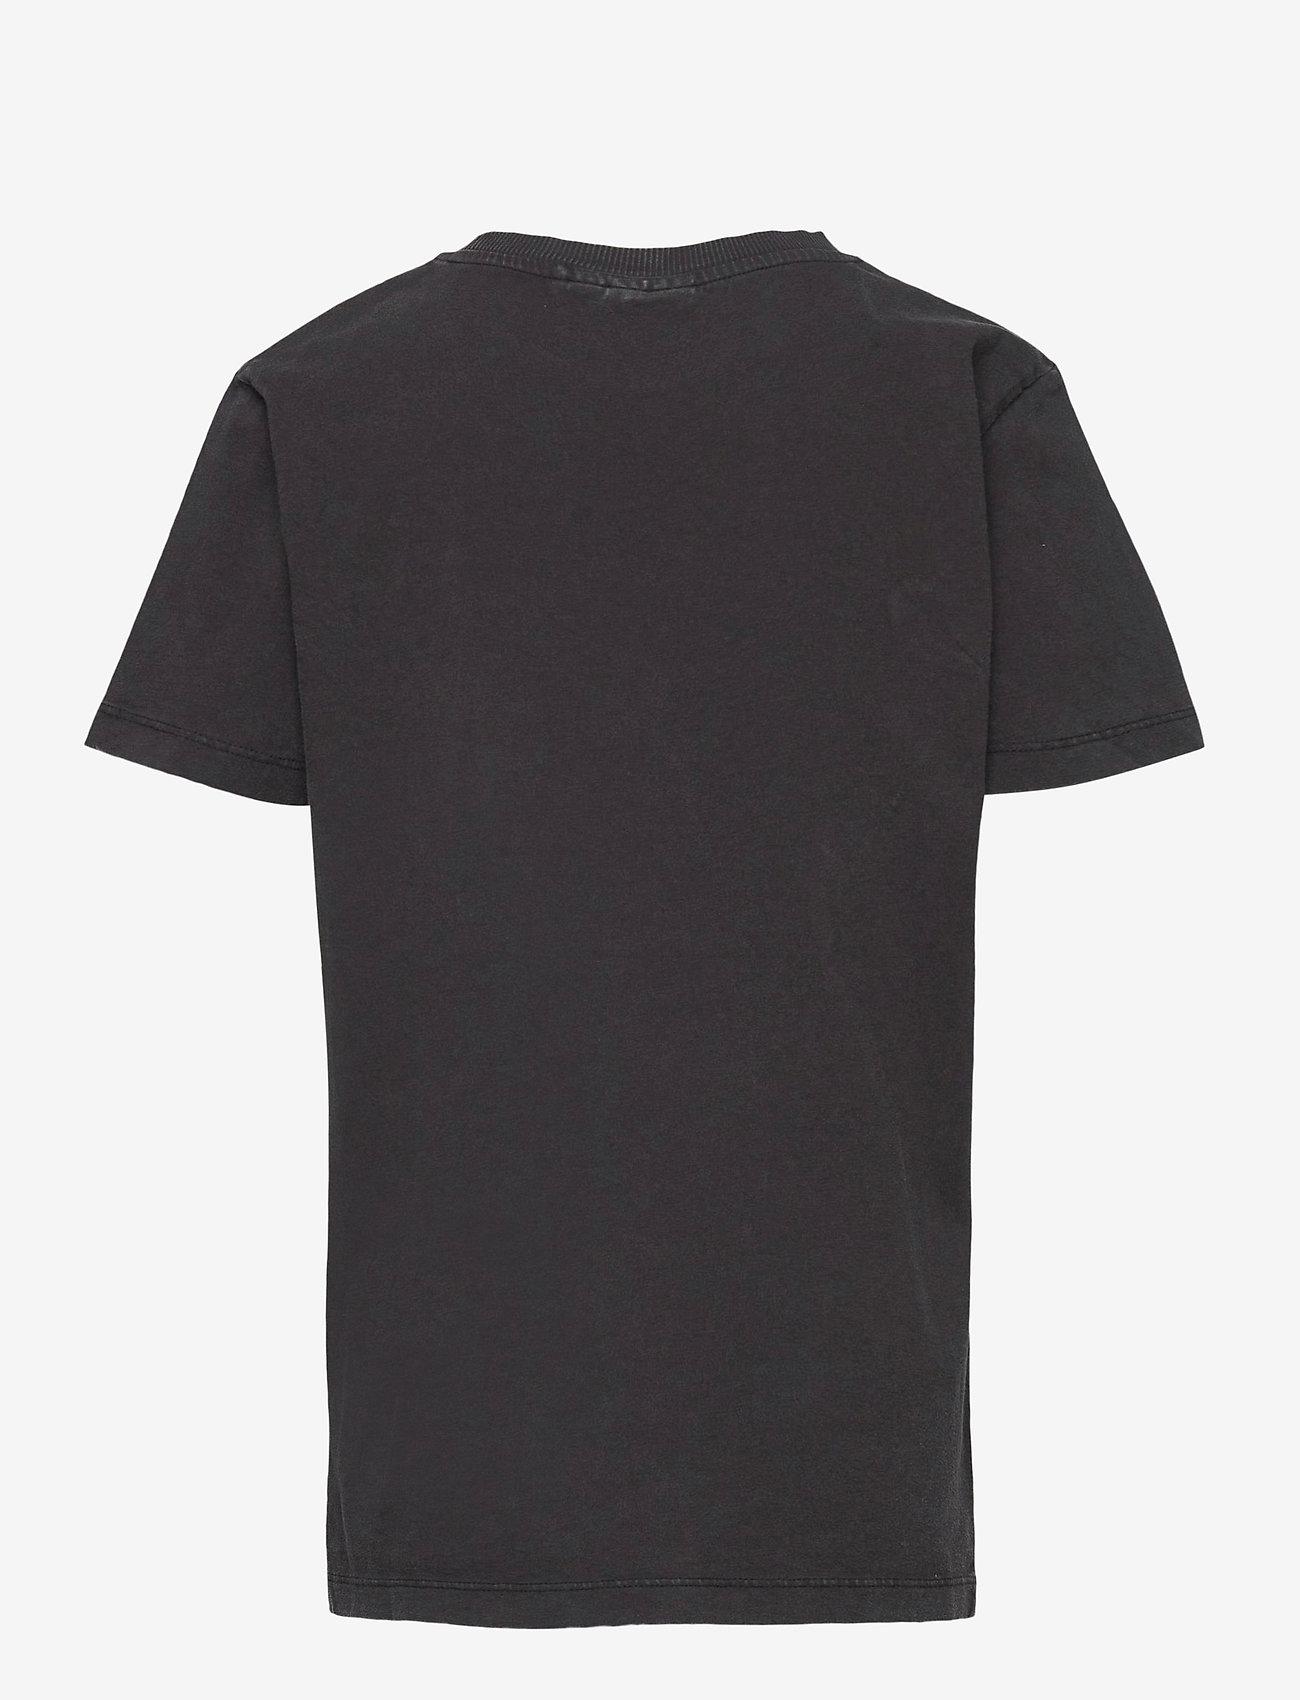 LMTD - NLMBASTIAN SS R TOP - t-shirts - black - 1